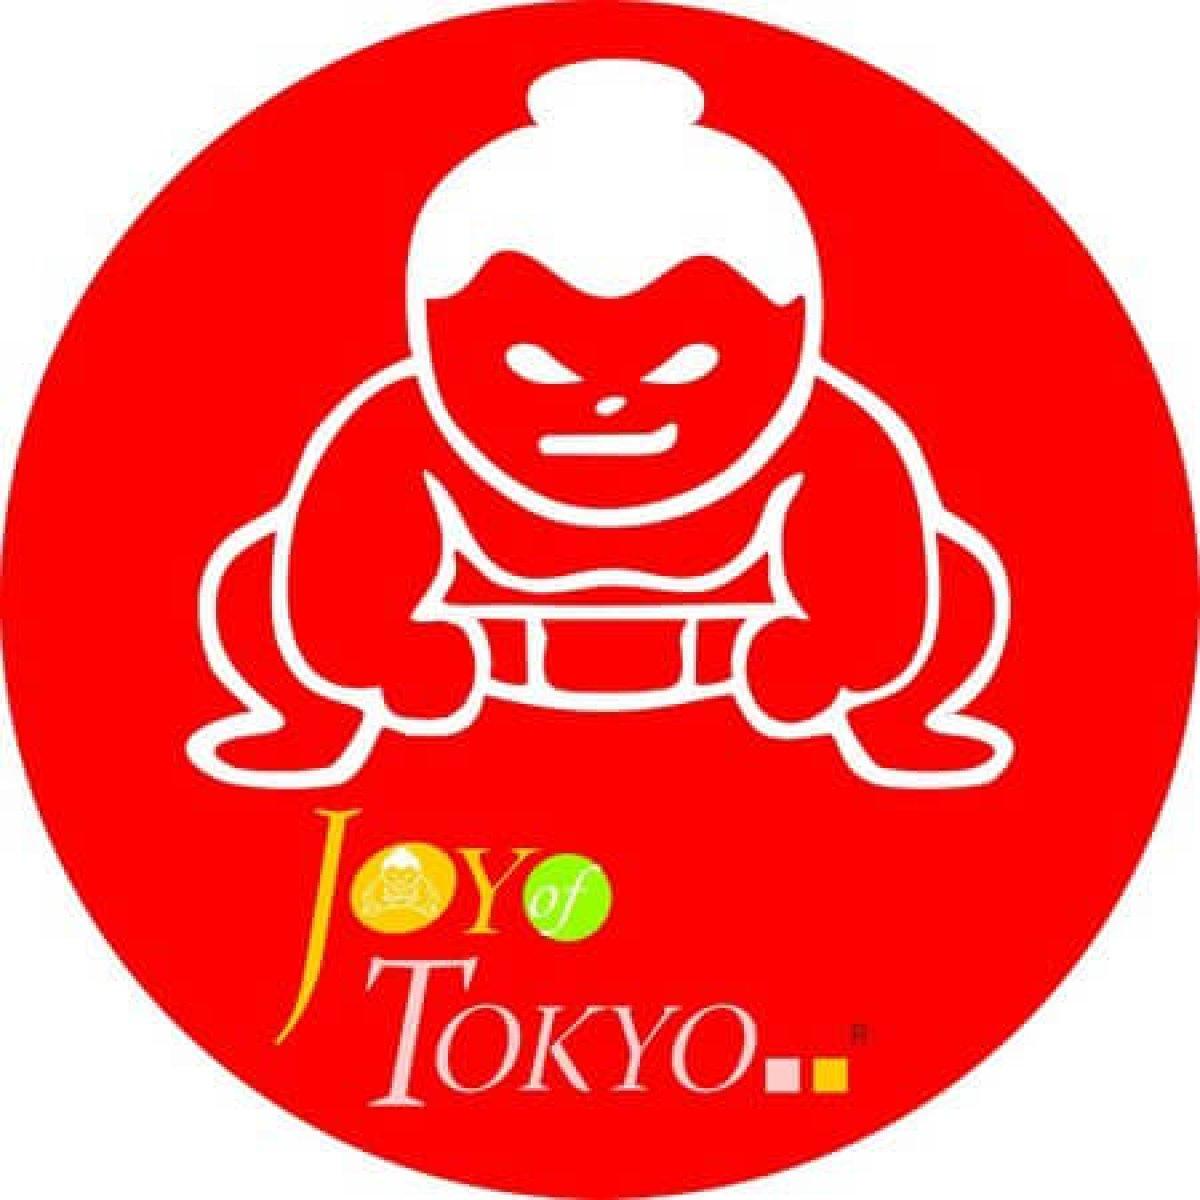 joytokyo - National Restaurant Properties